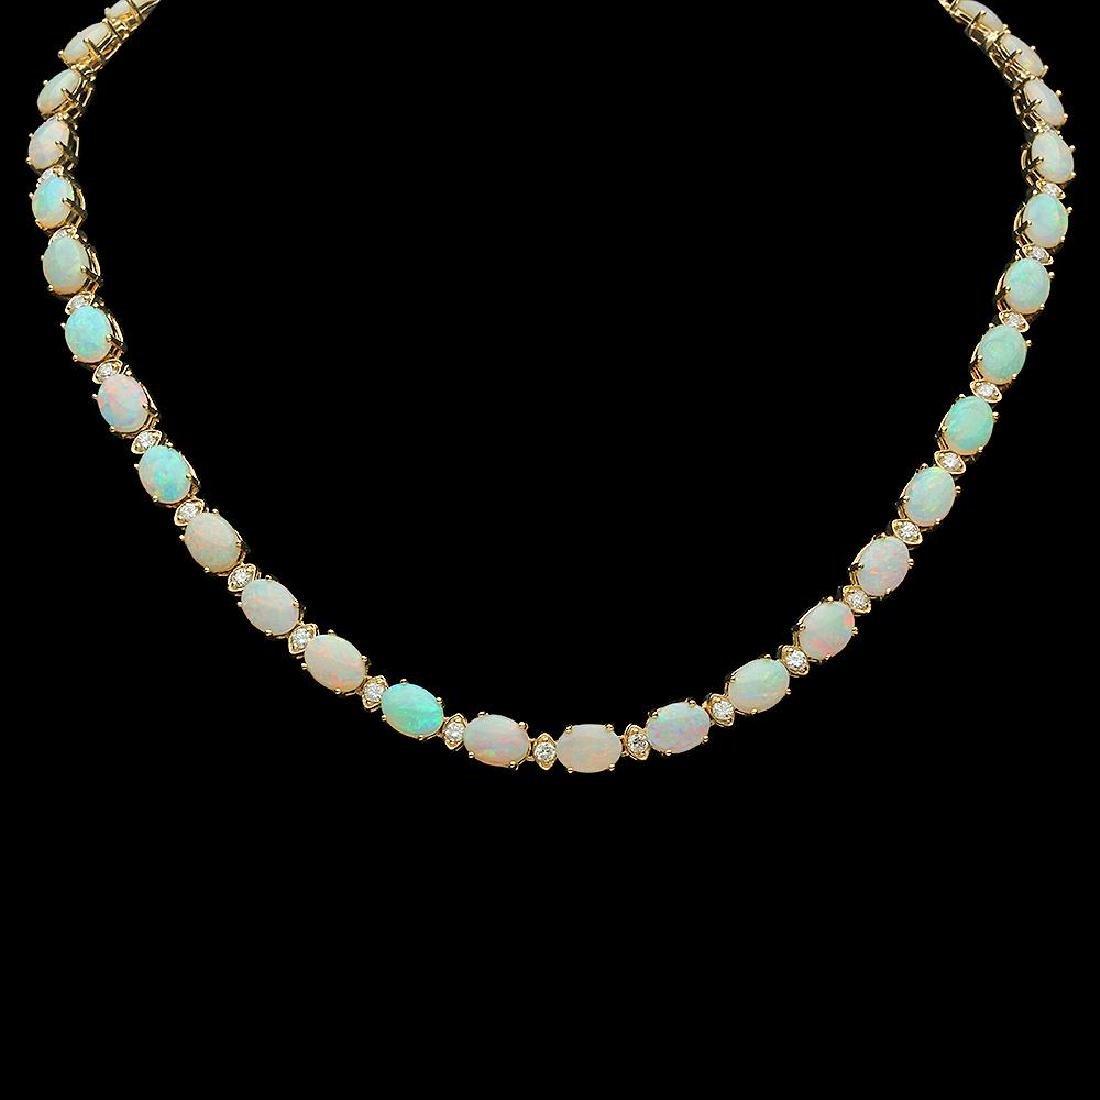 14K Gold 24.51ct Opal 2.24ct Diamond Necklace